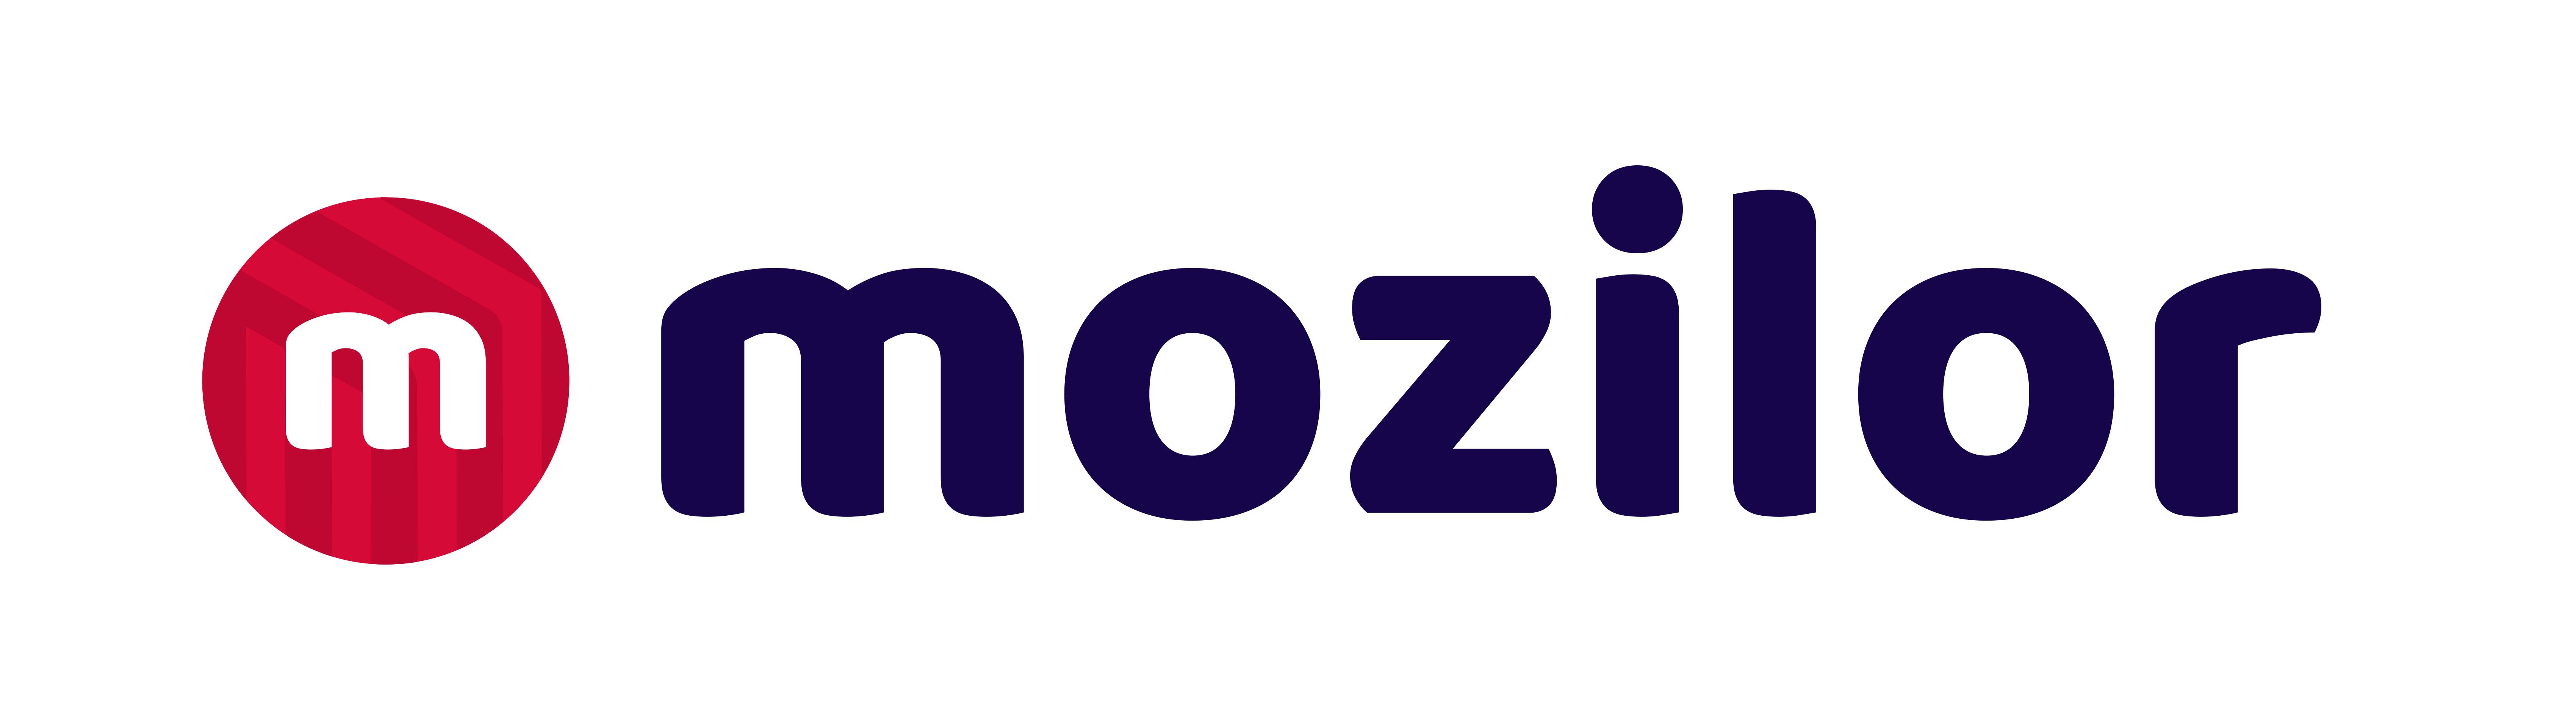 Mozilor_logo